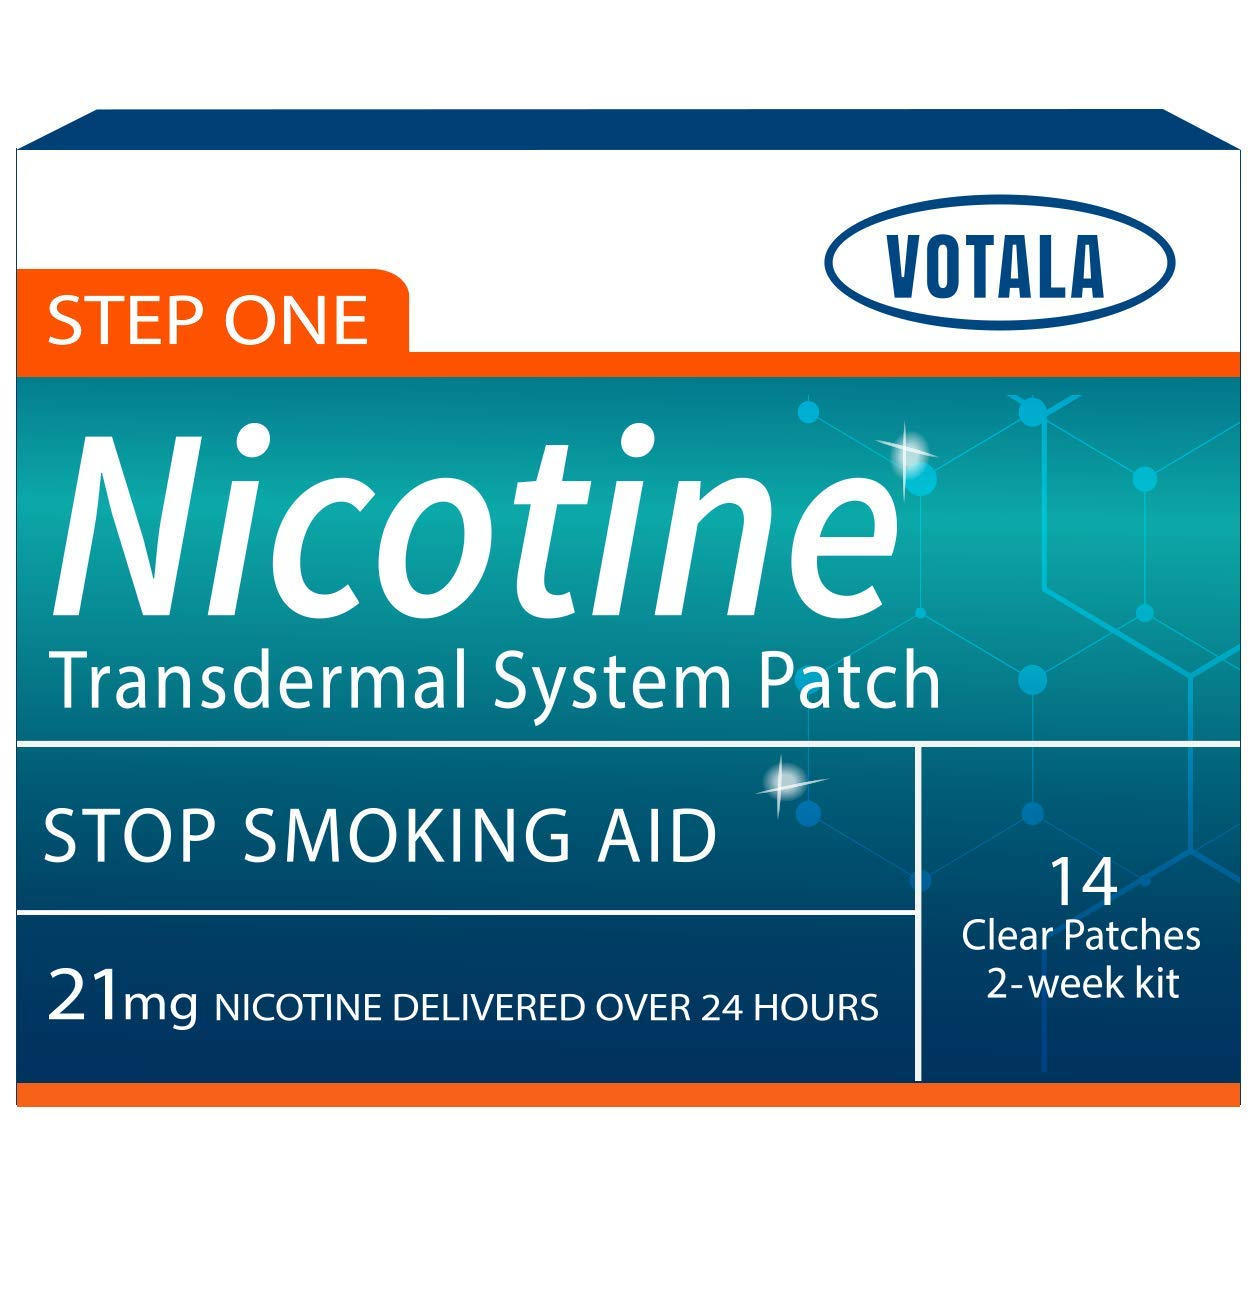 Votala Nicotine Patches Delivered Transdermal